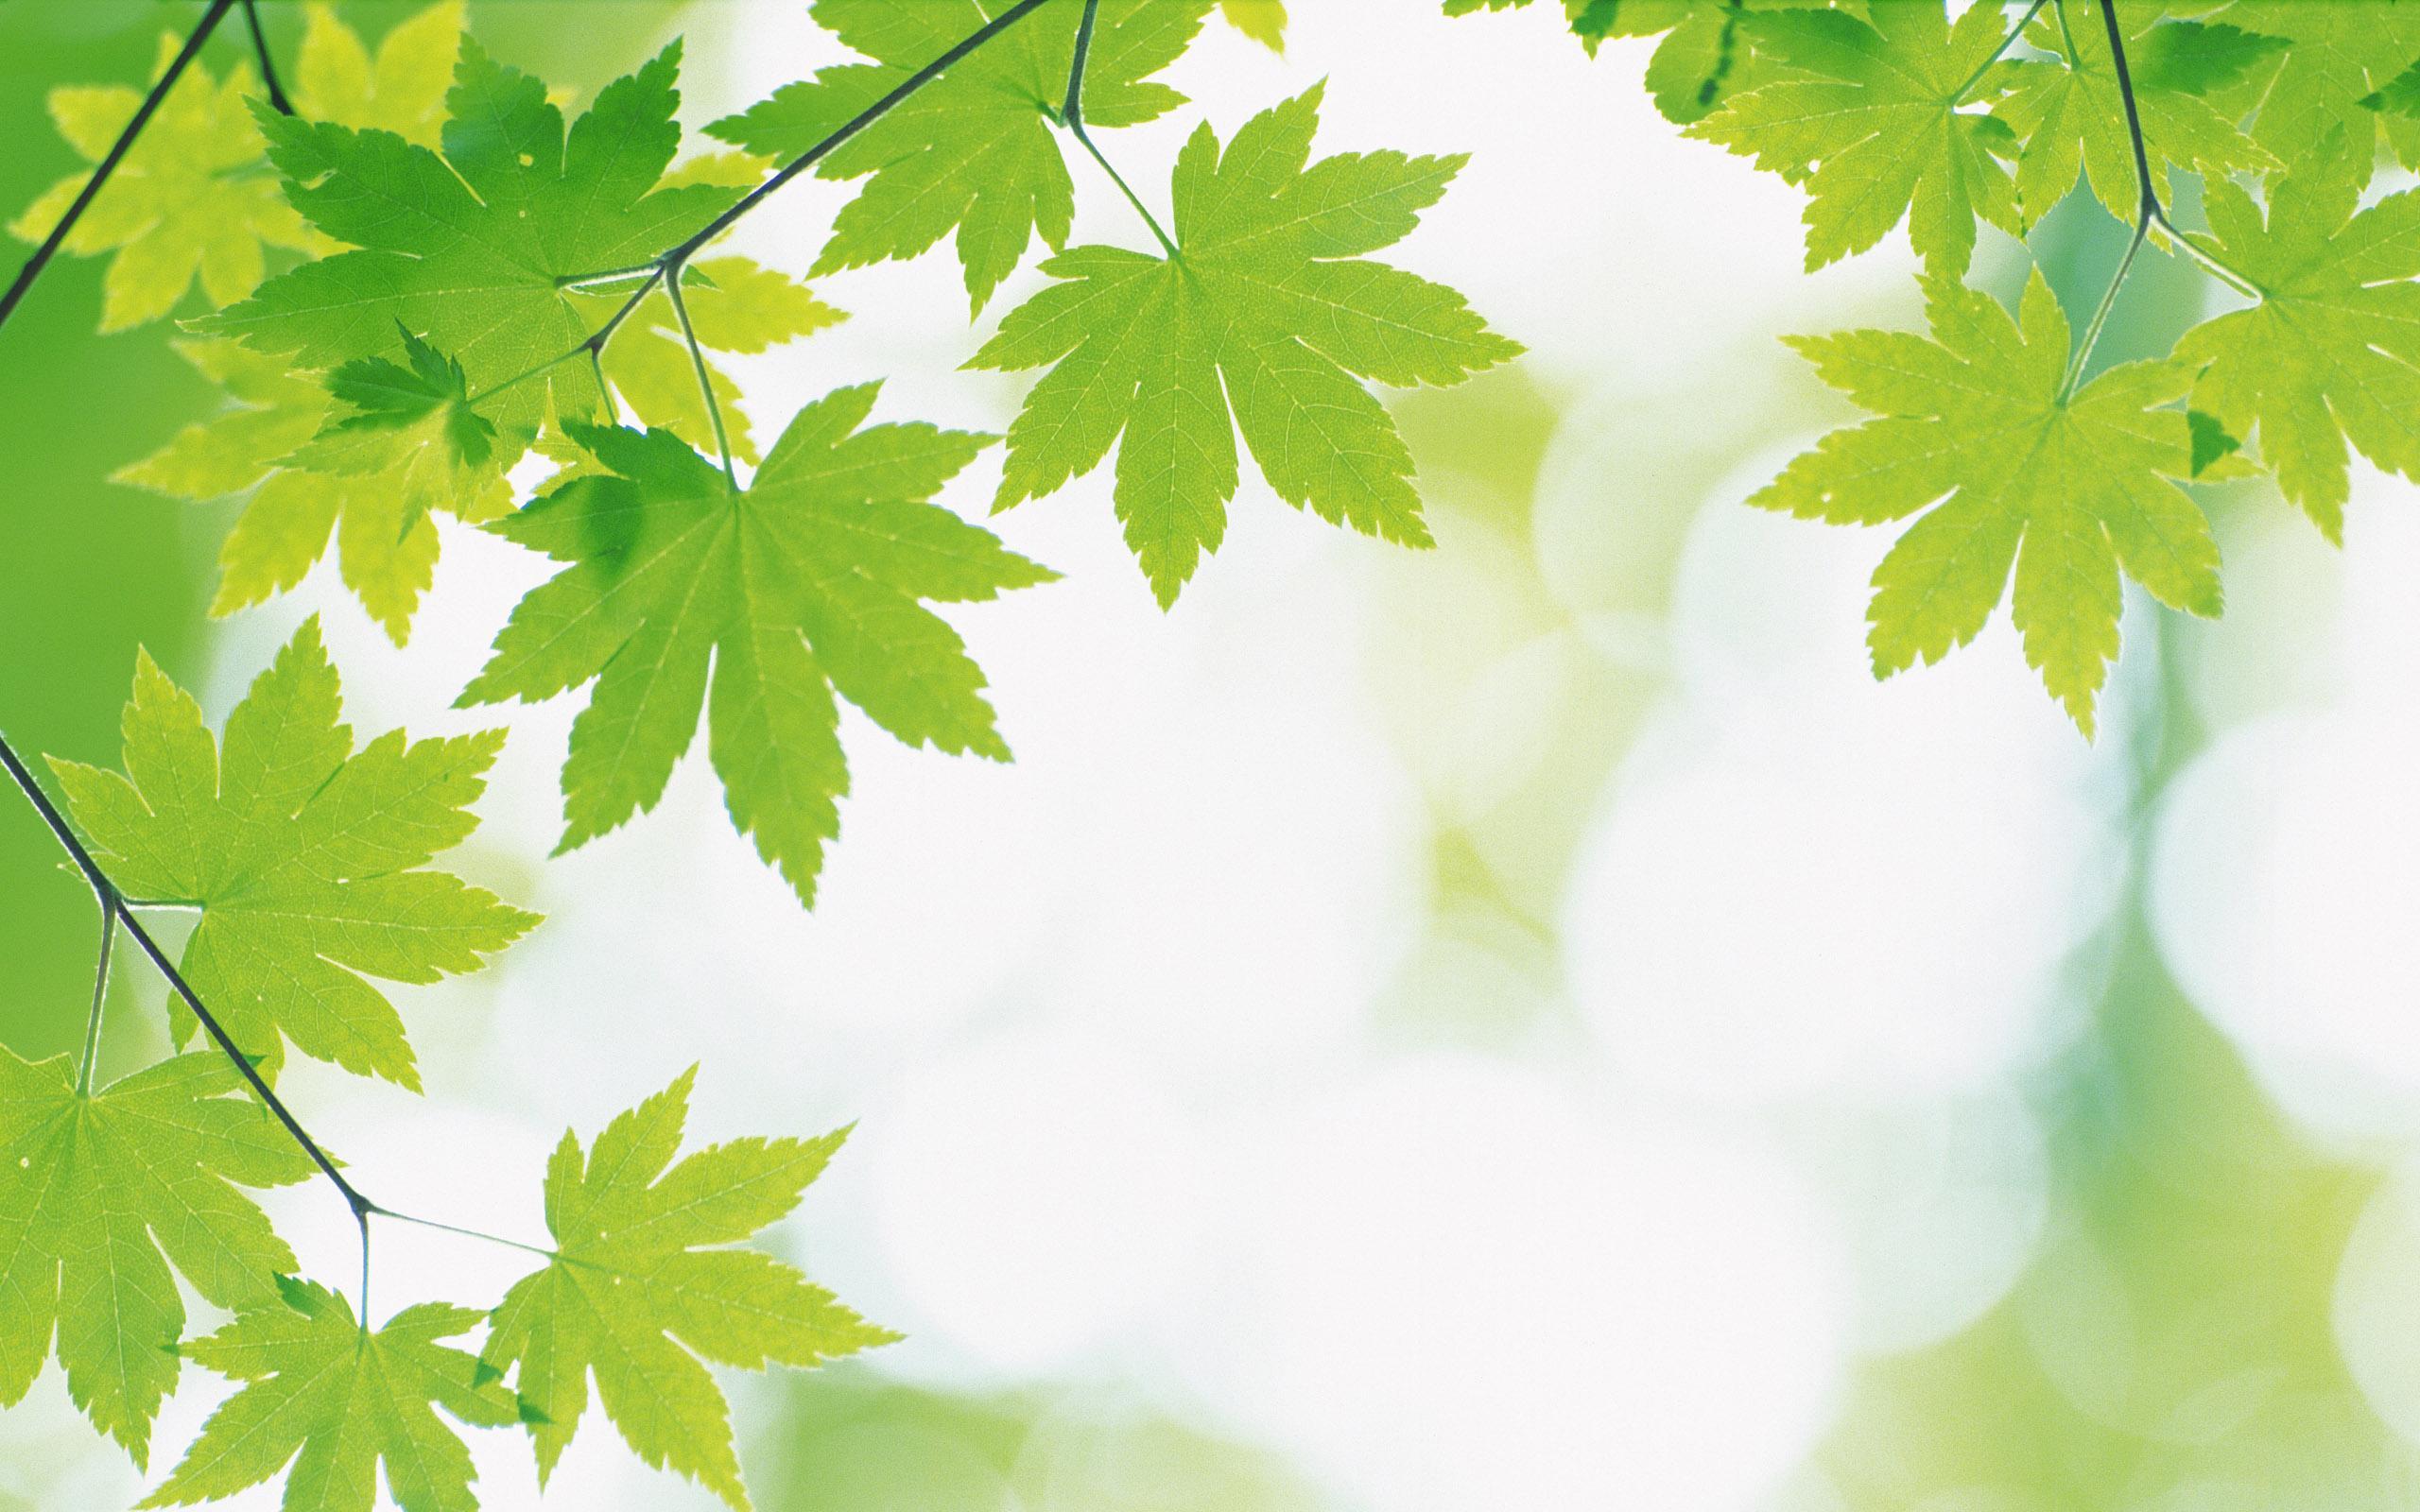 Green Nature Wallpaper - Nature Wallpaper Green - HD Wallpaper